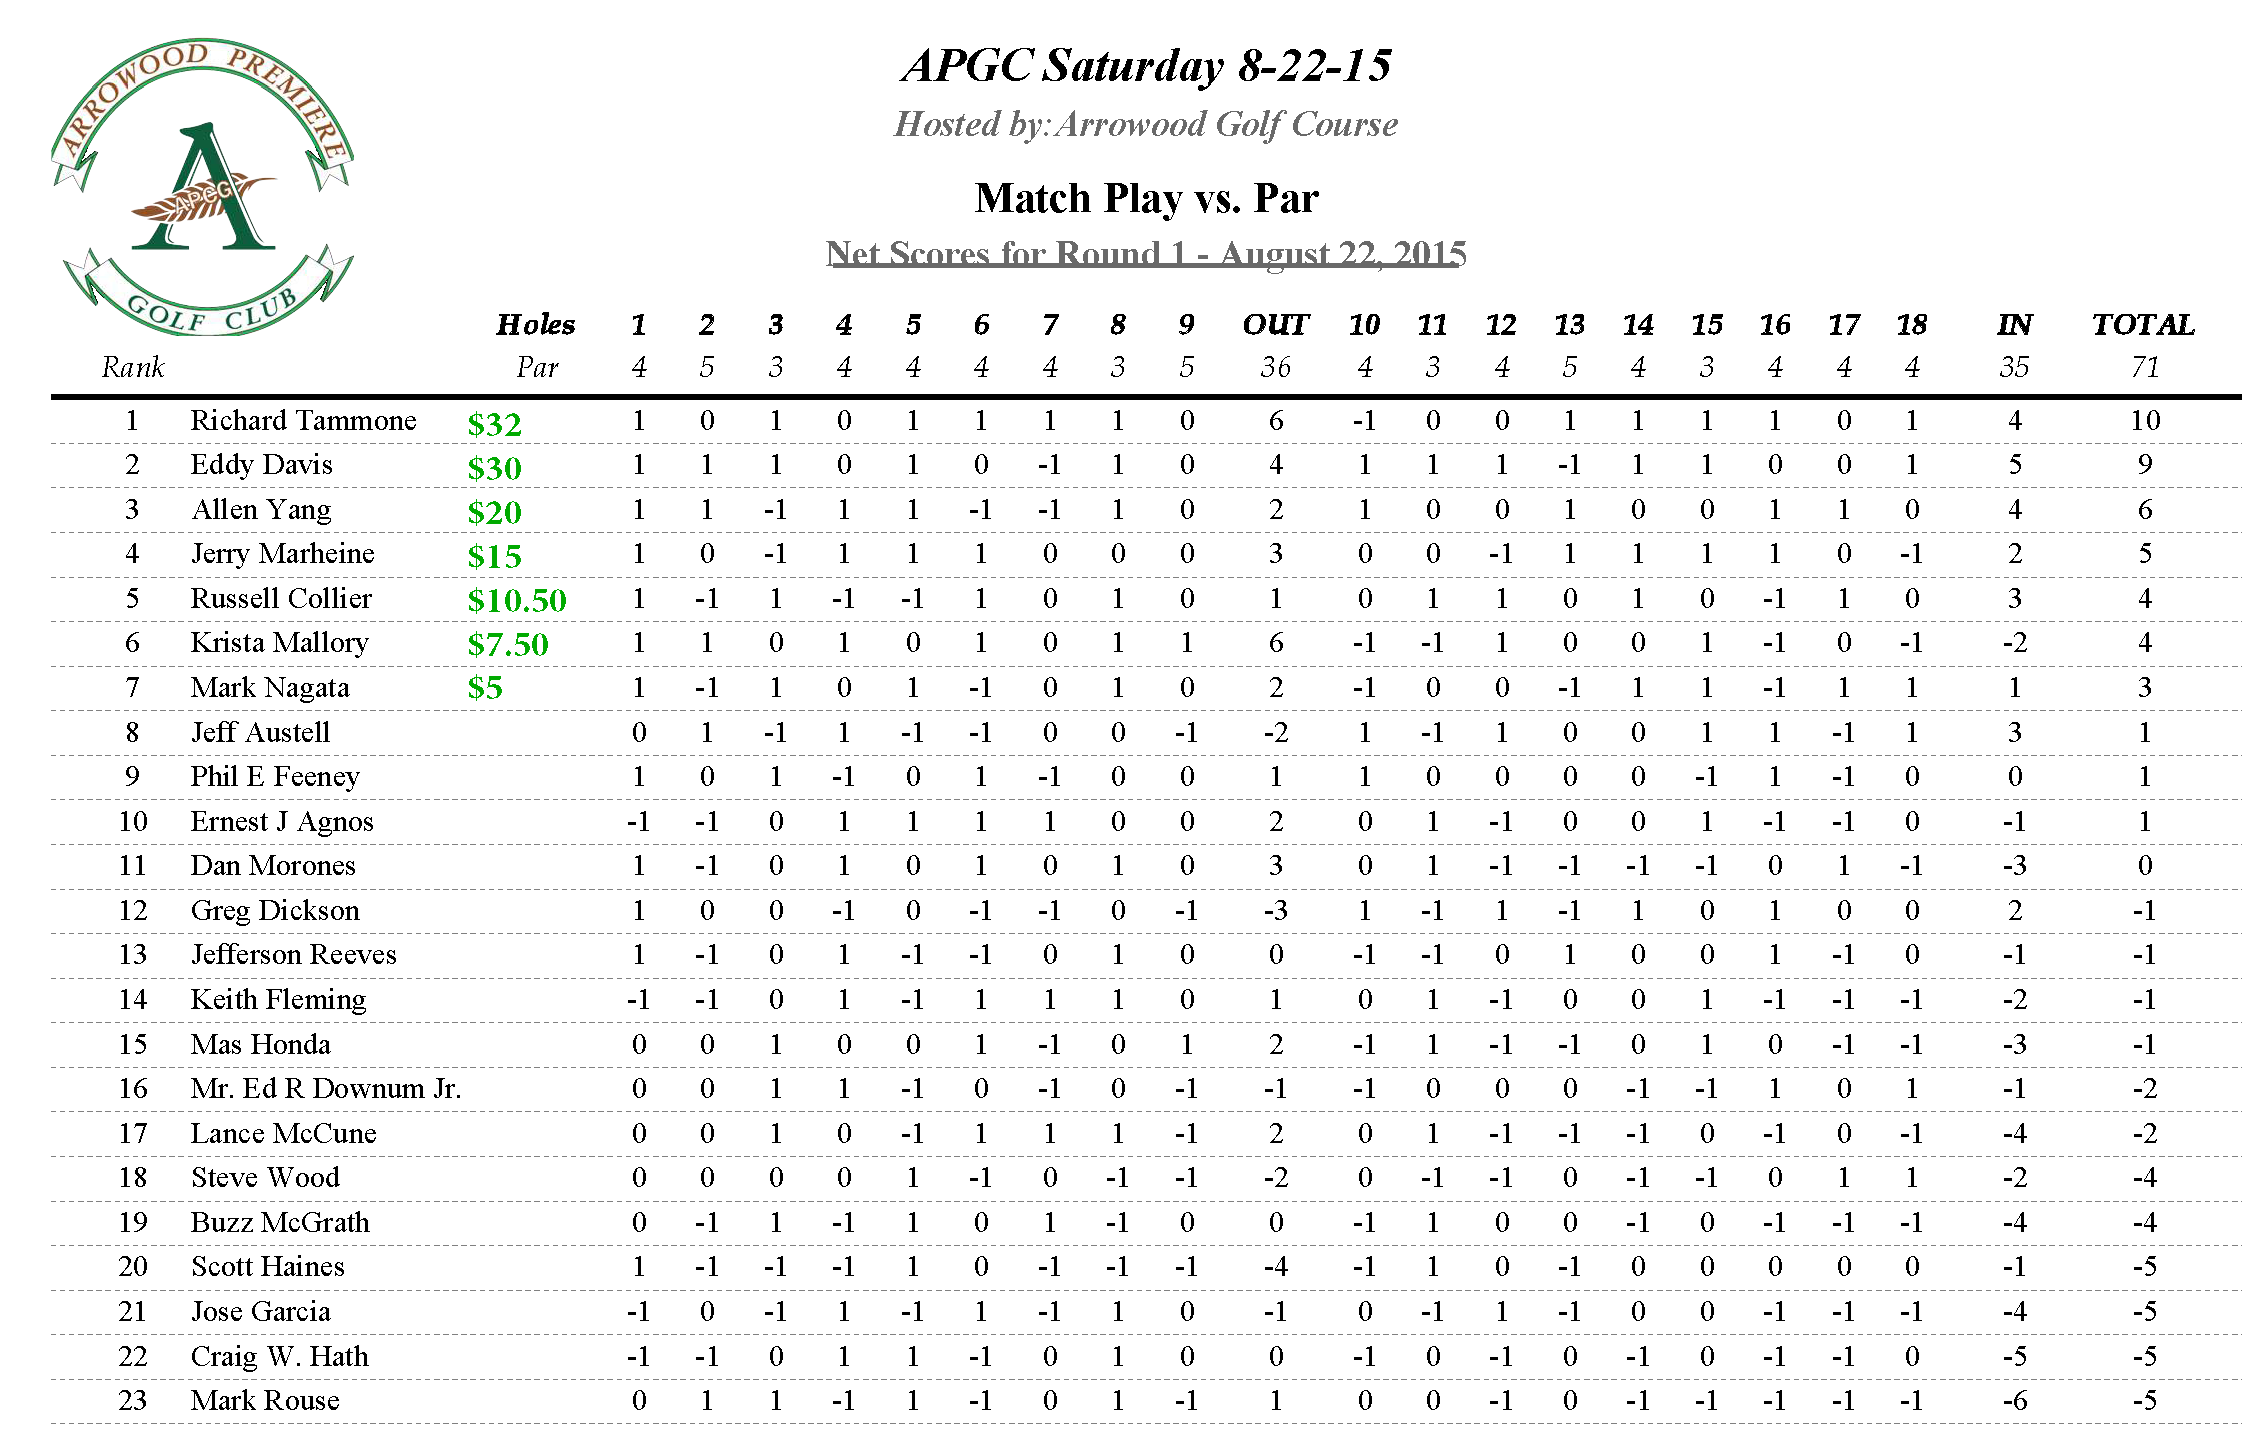 APGC Saturday 8-22-15